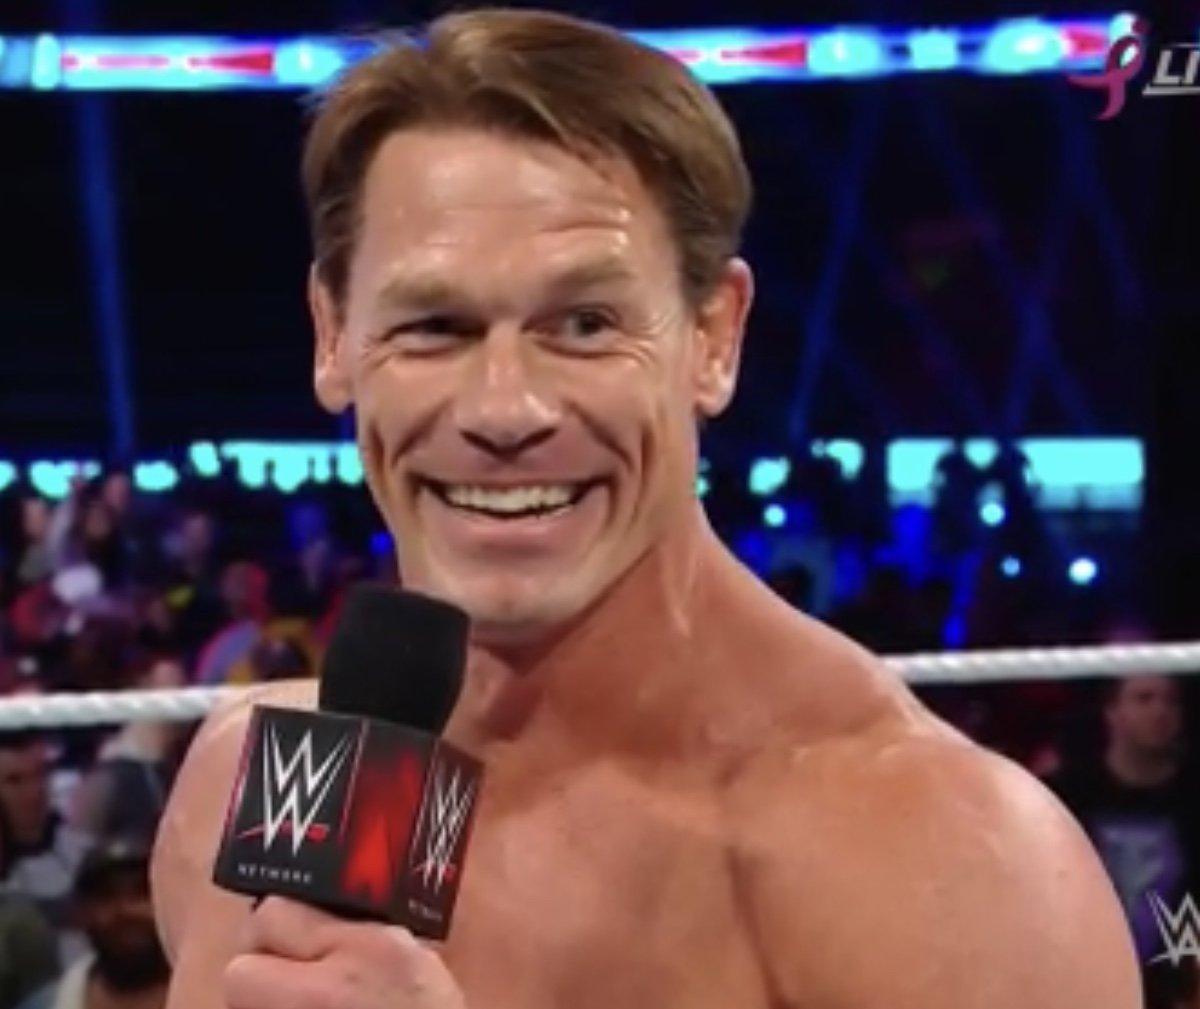 Hair Cutting John Cena